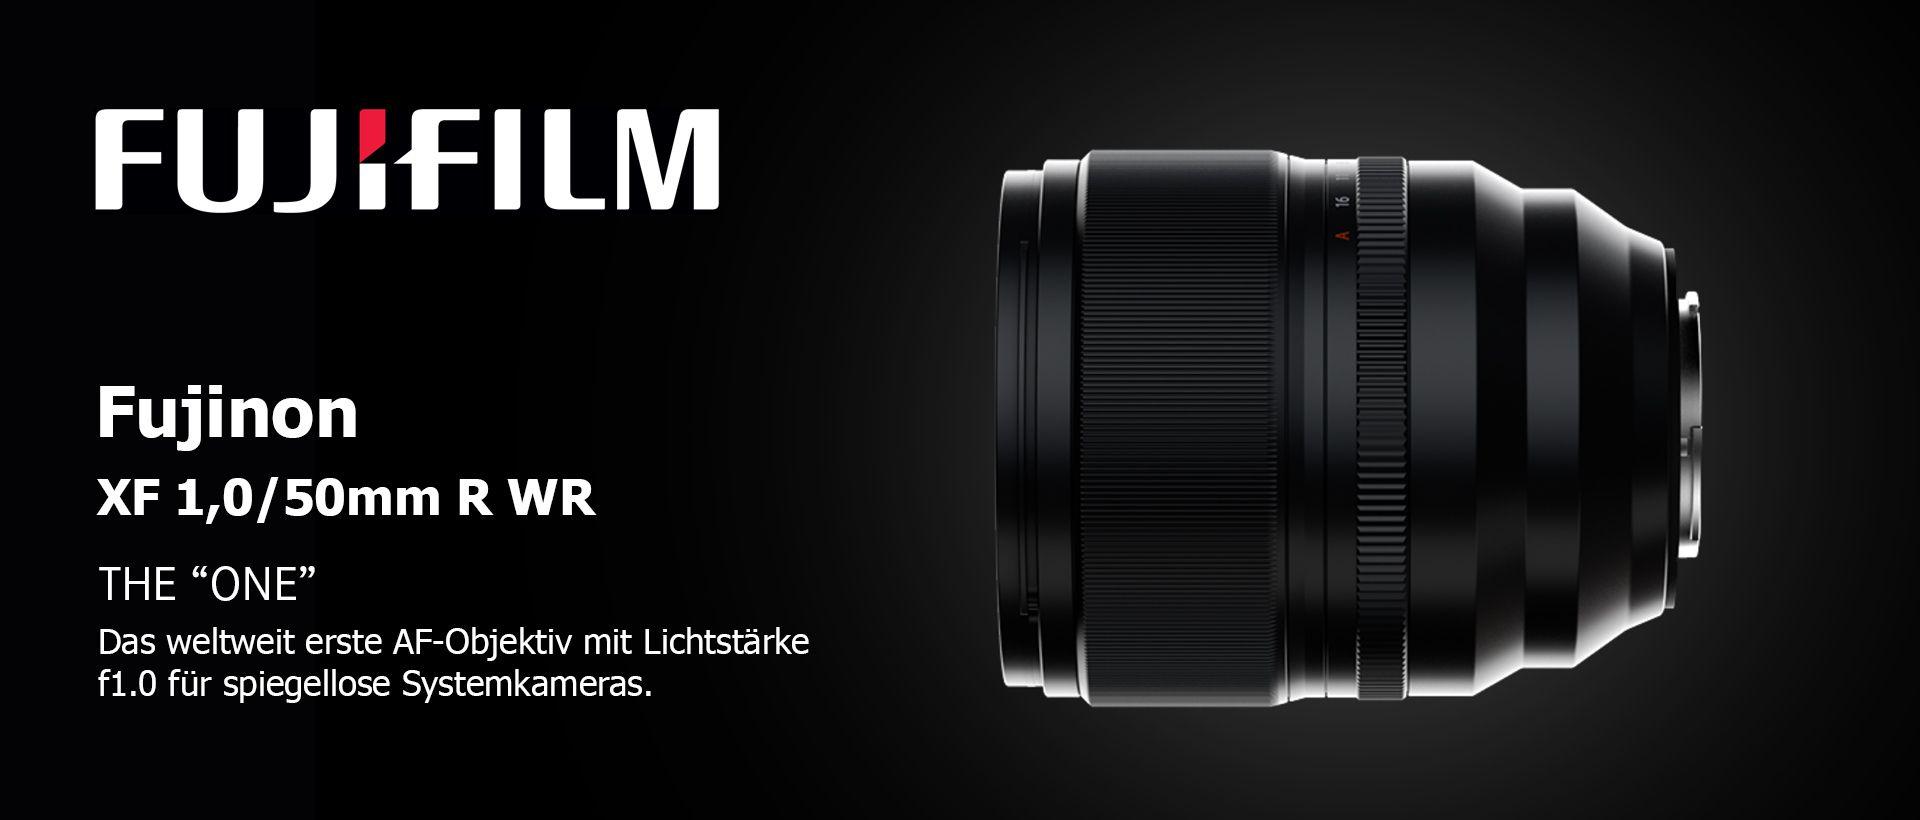 Fujinon XF 1,0/50mm R WR